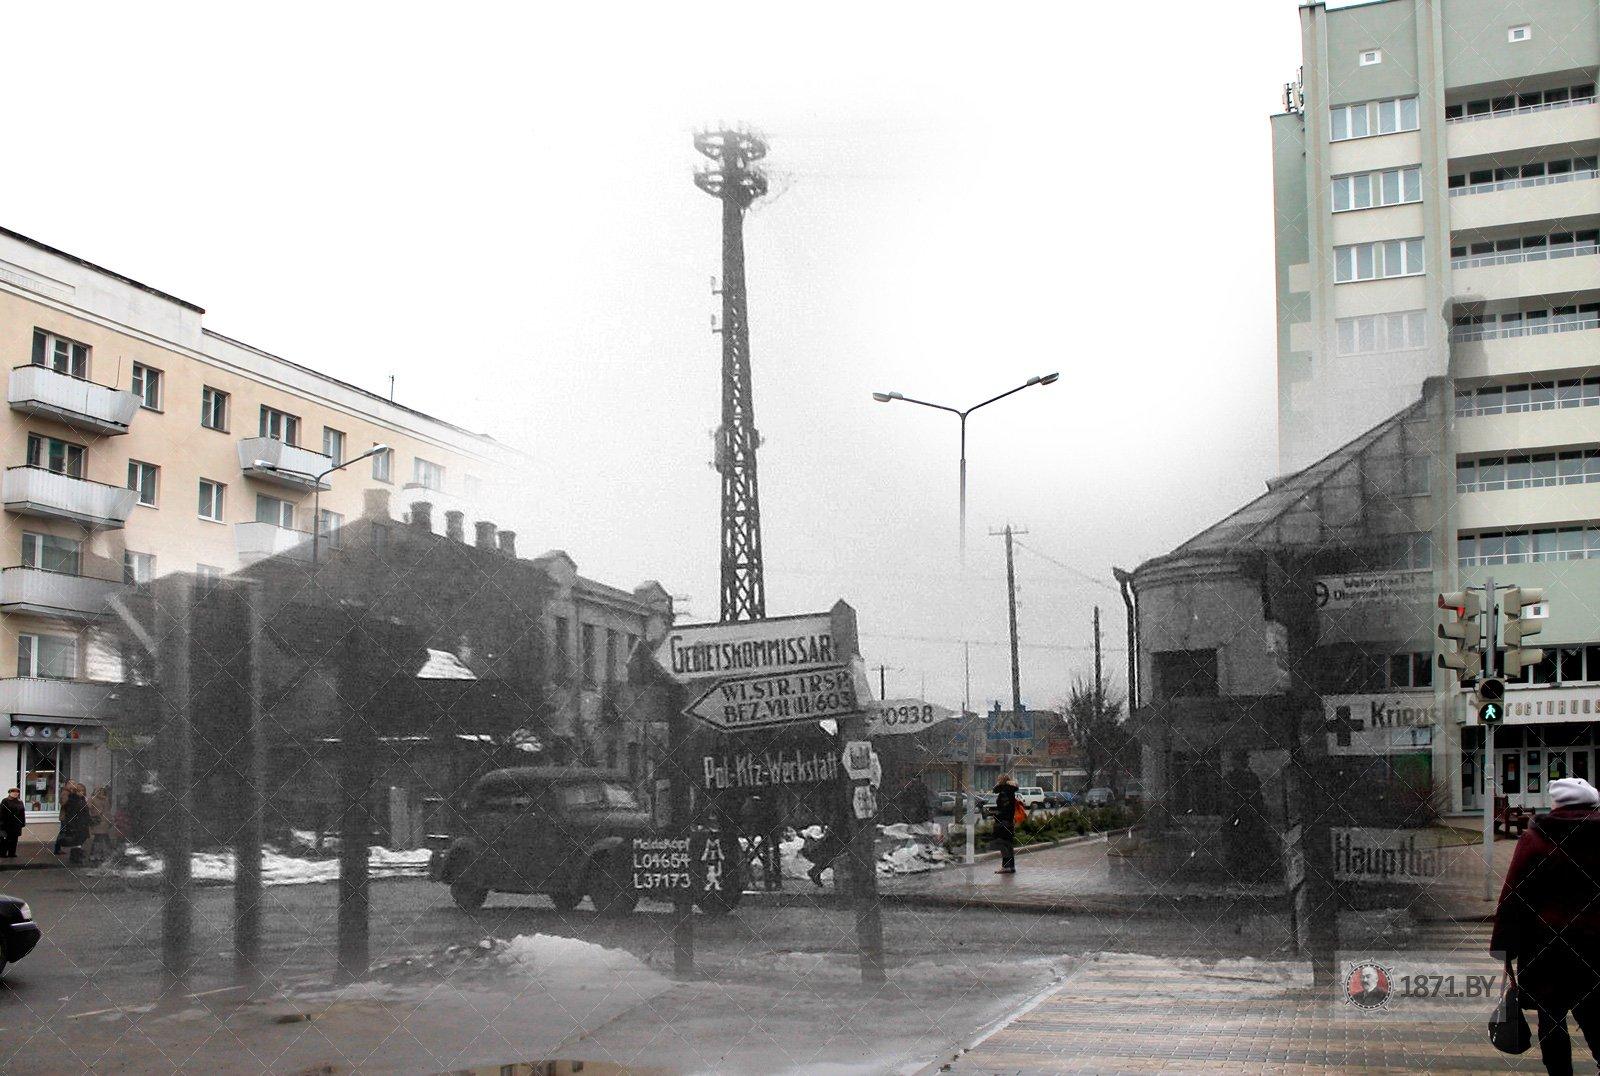 1943_marynskaya_1871by